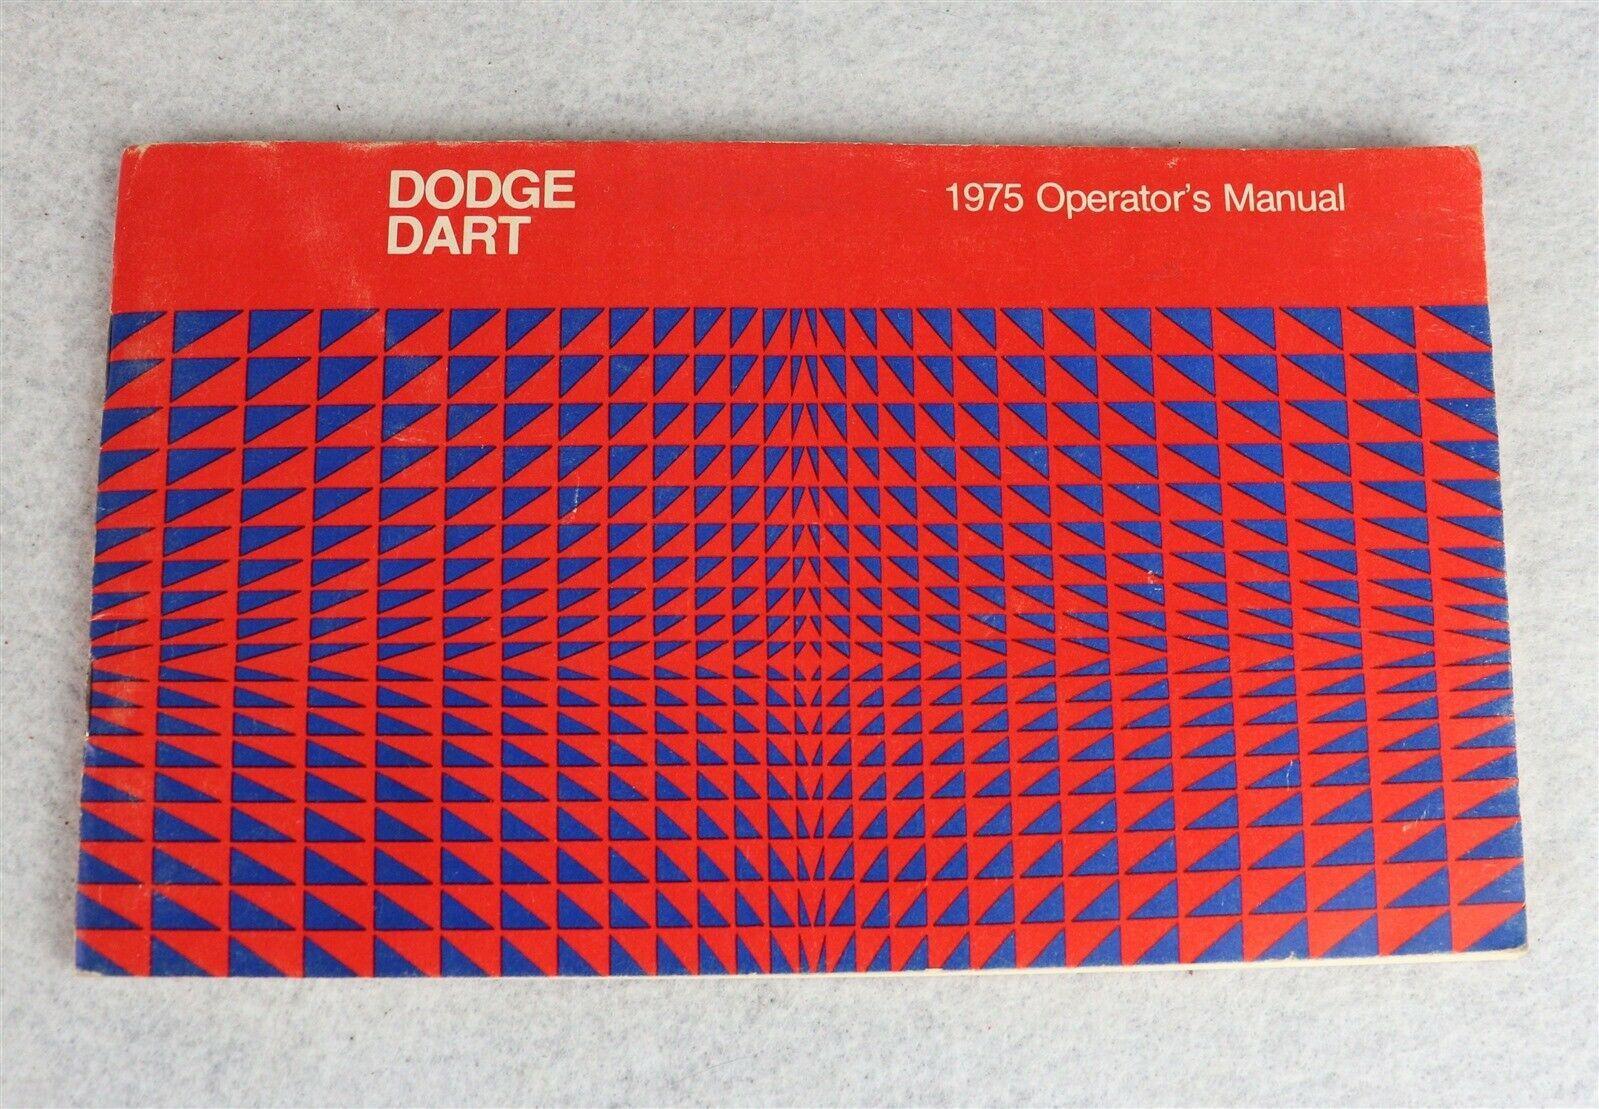 1975 Dodge Dart Operator's Manual